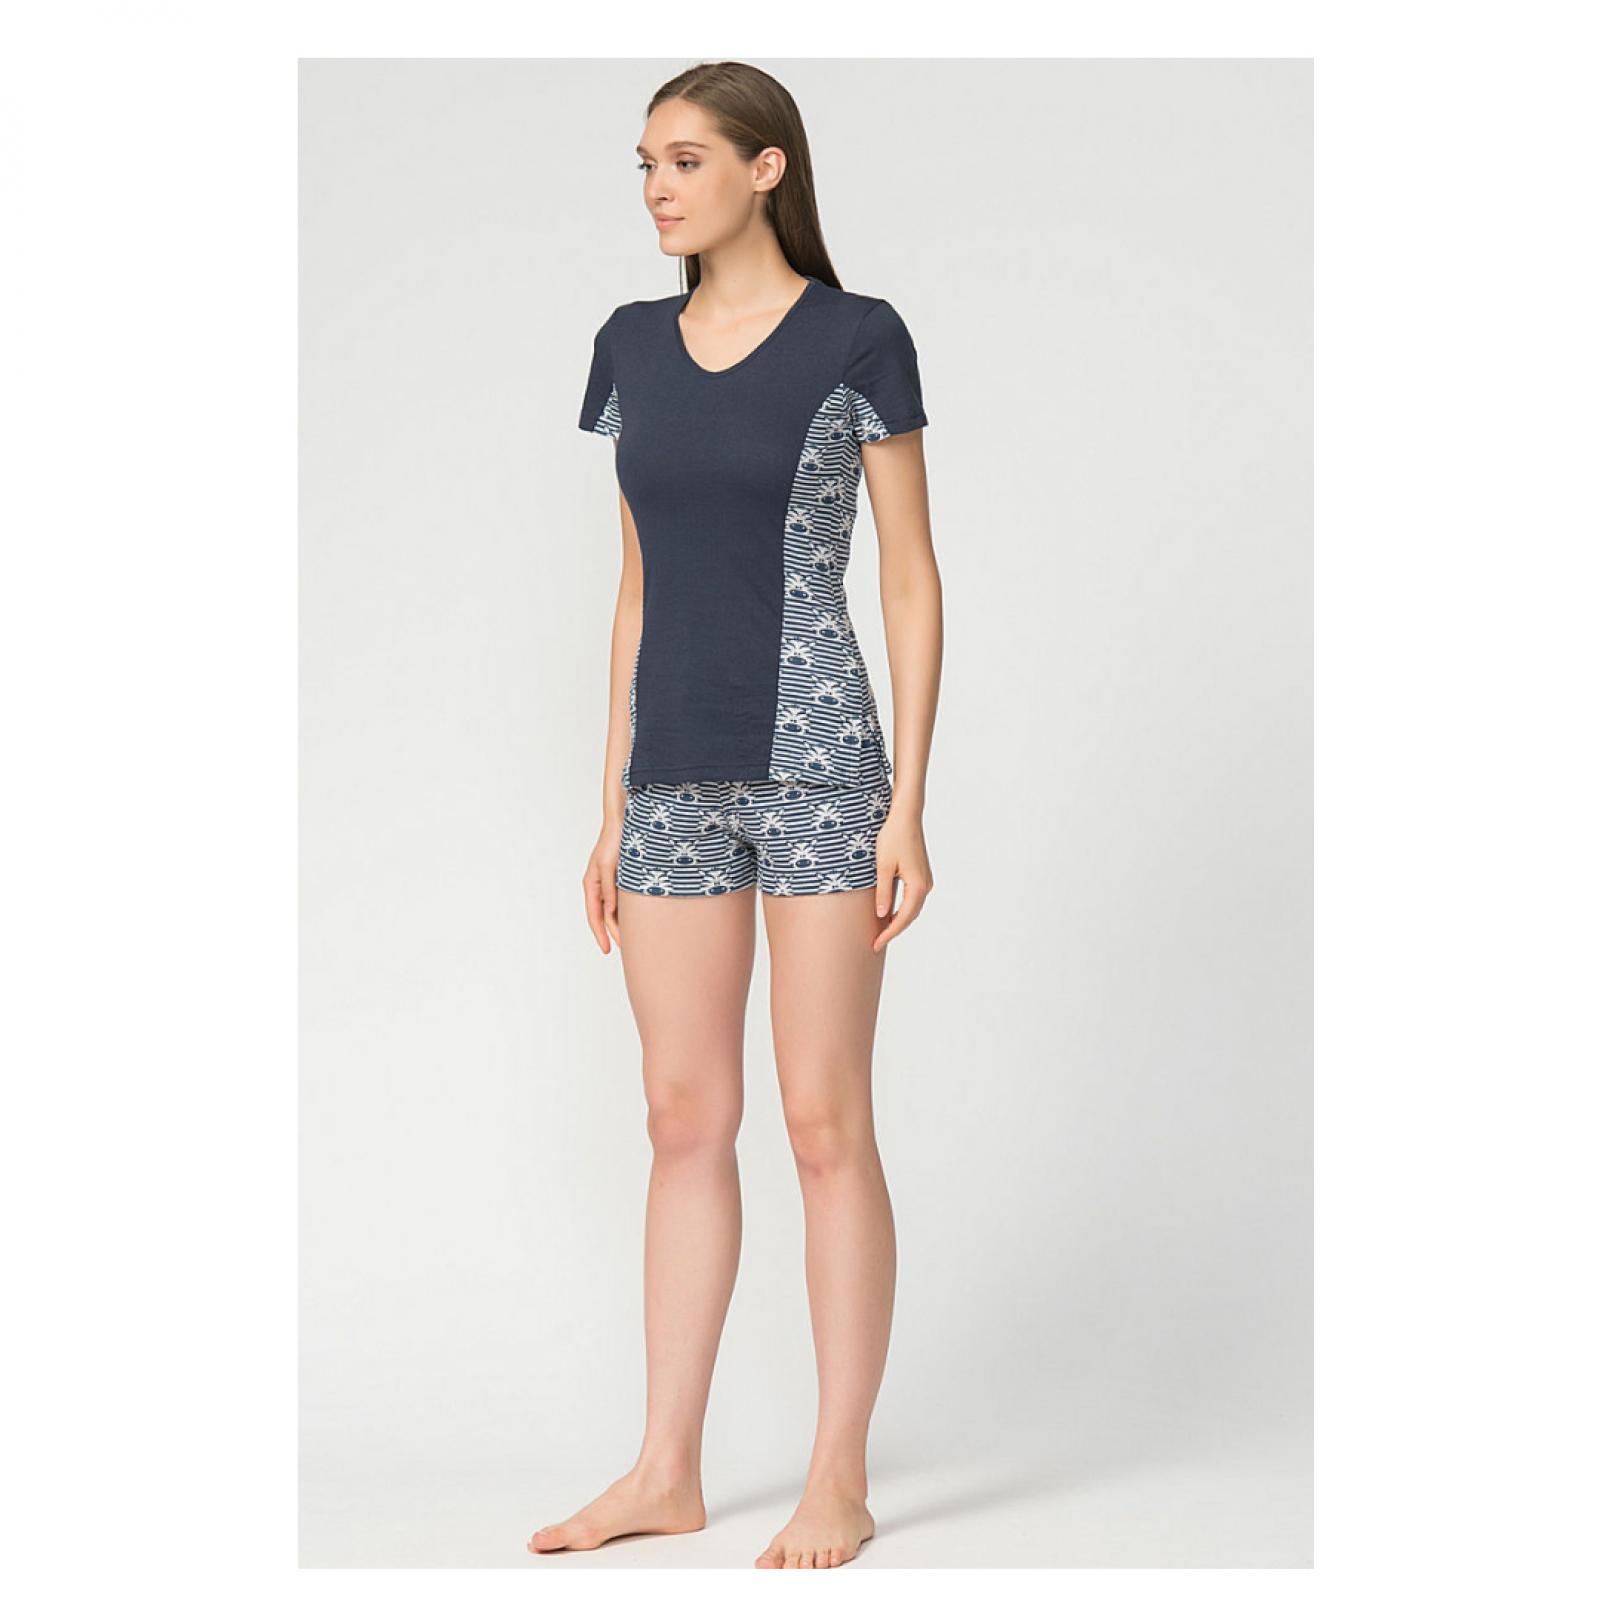 Пижама Зебра (футболка + шорты) М-0043